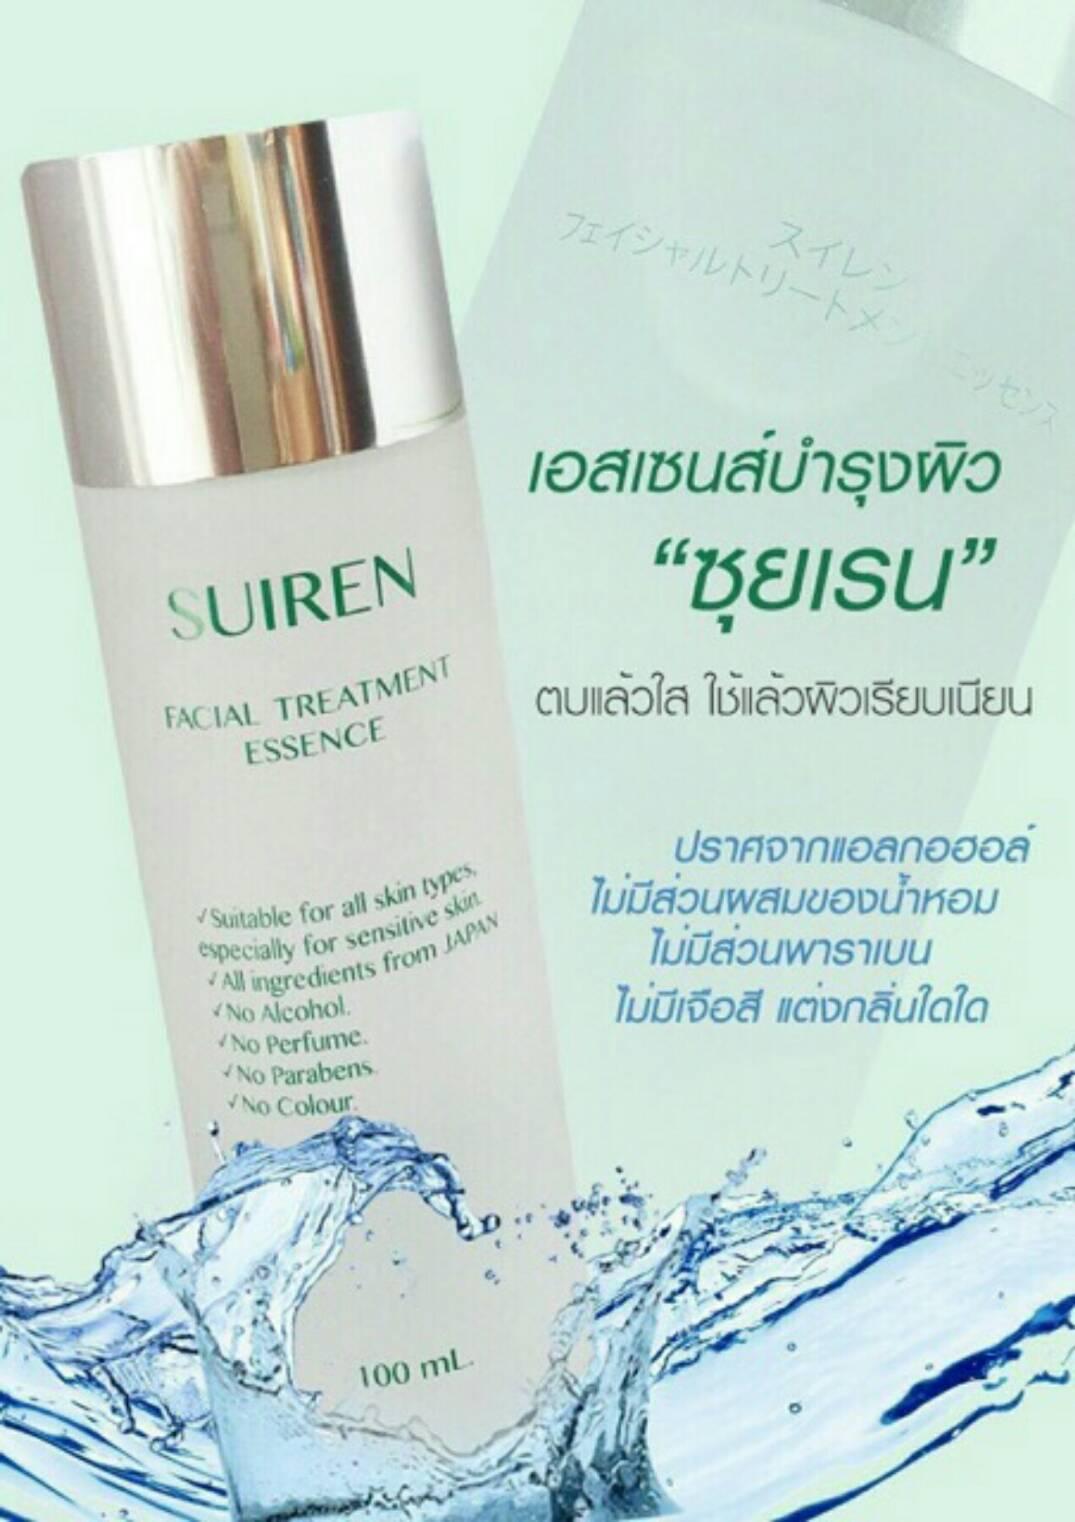 Suiren Facial Treatment Essence น้ำตบบำรุงผิว ปริมาณ 100 ml. โปรโมชั่นพิเศษสำหรับลูกค้าประจำ&ลูกค้าเก่า ราคา 900.- ถึง 1/3/2560